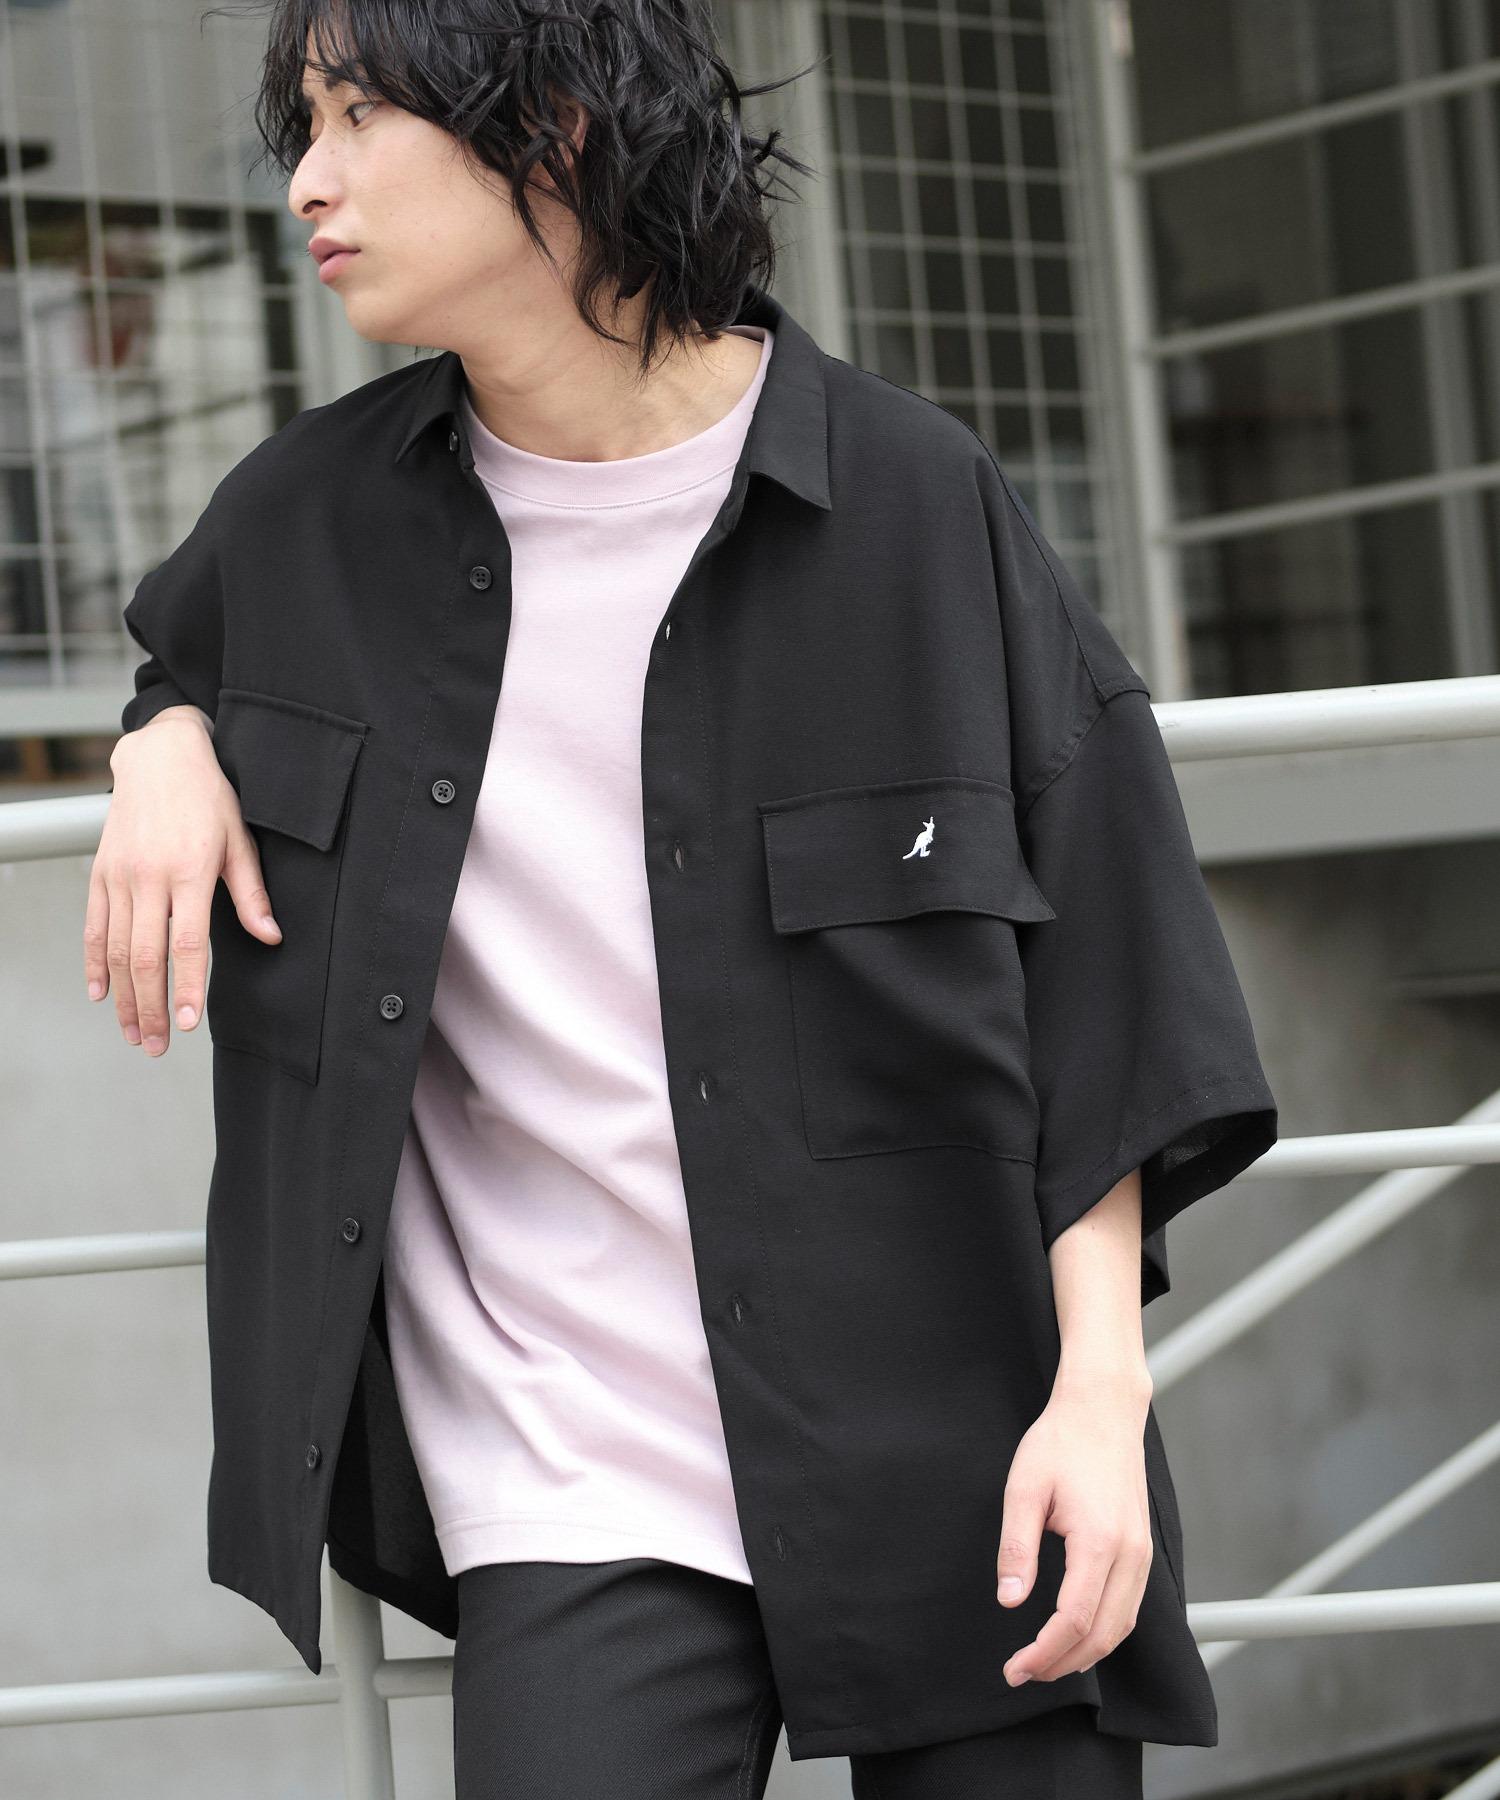 MONO-MART×KANGOL リラックスレギュラー クレリックカラー オーバーサイズ ドレープ 1/2 sleeve CPOシャツ